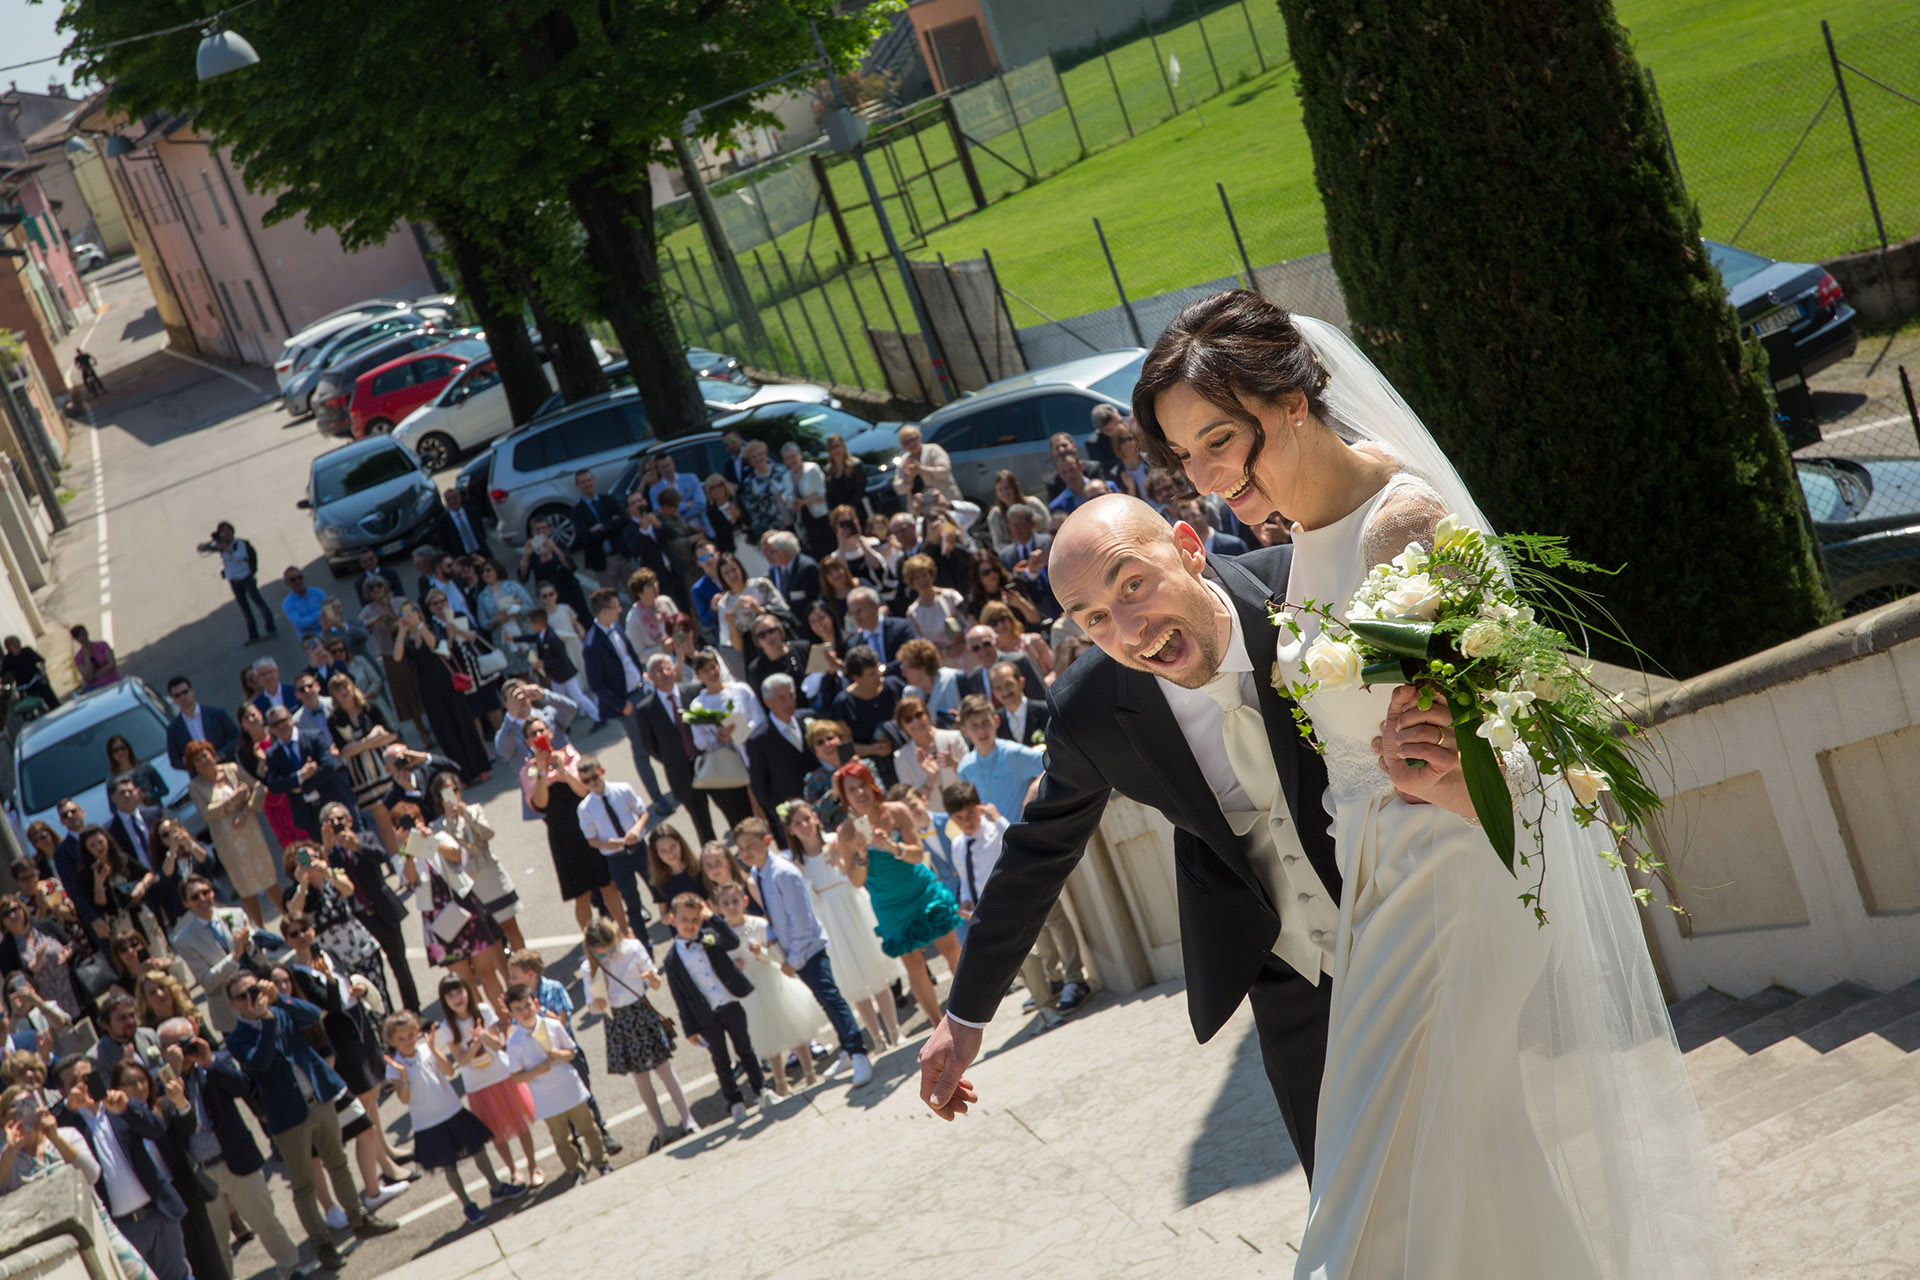 Matrimonio Chiara & Nicola a Dogana Veneta, Lazise (VR) - L'Uomo Griffe Boutique